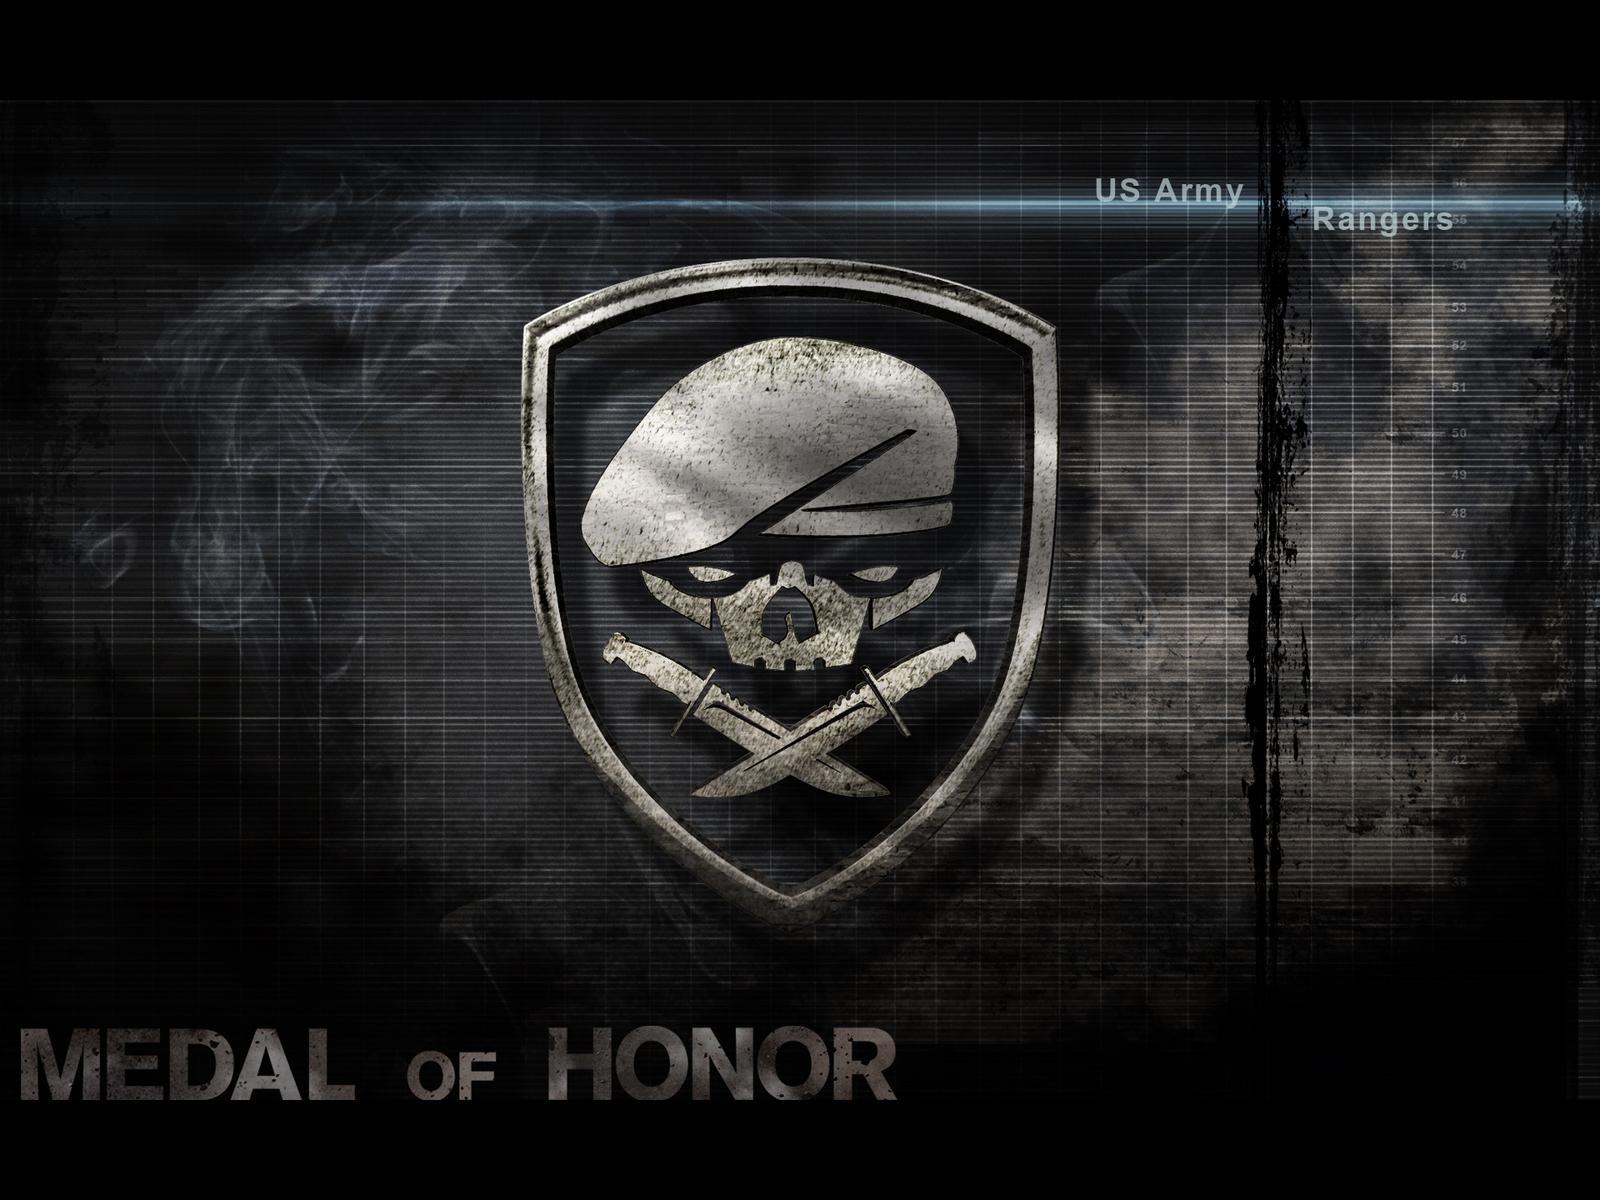 us army rangers medal honor wallpaper us army rangers wallpaper us 1600x1200